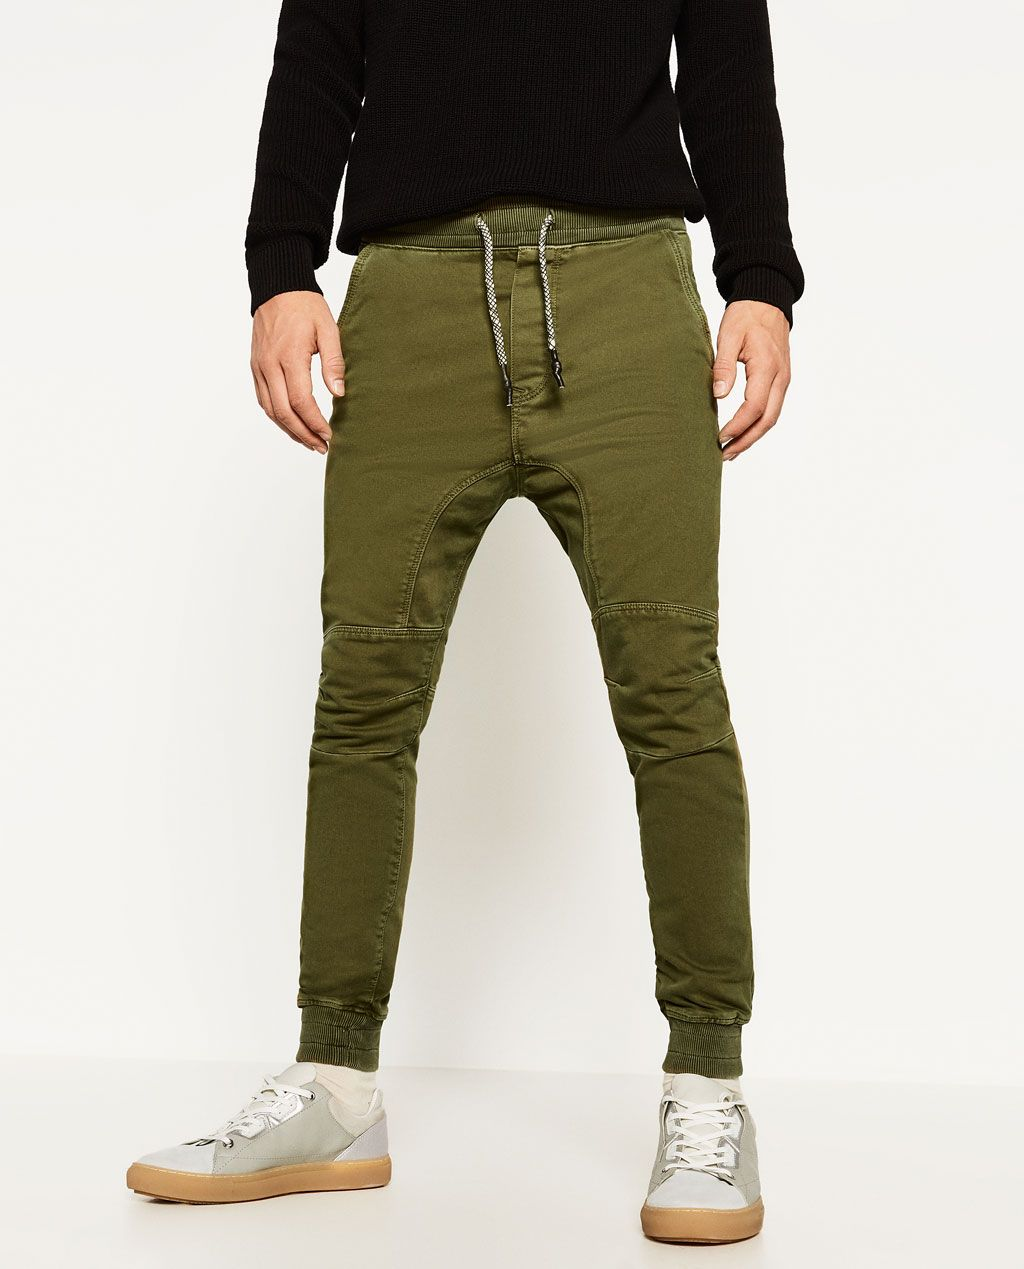 Zara Hombre Pantalon Soft Trousers Harem Pants Pants